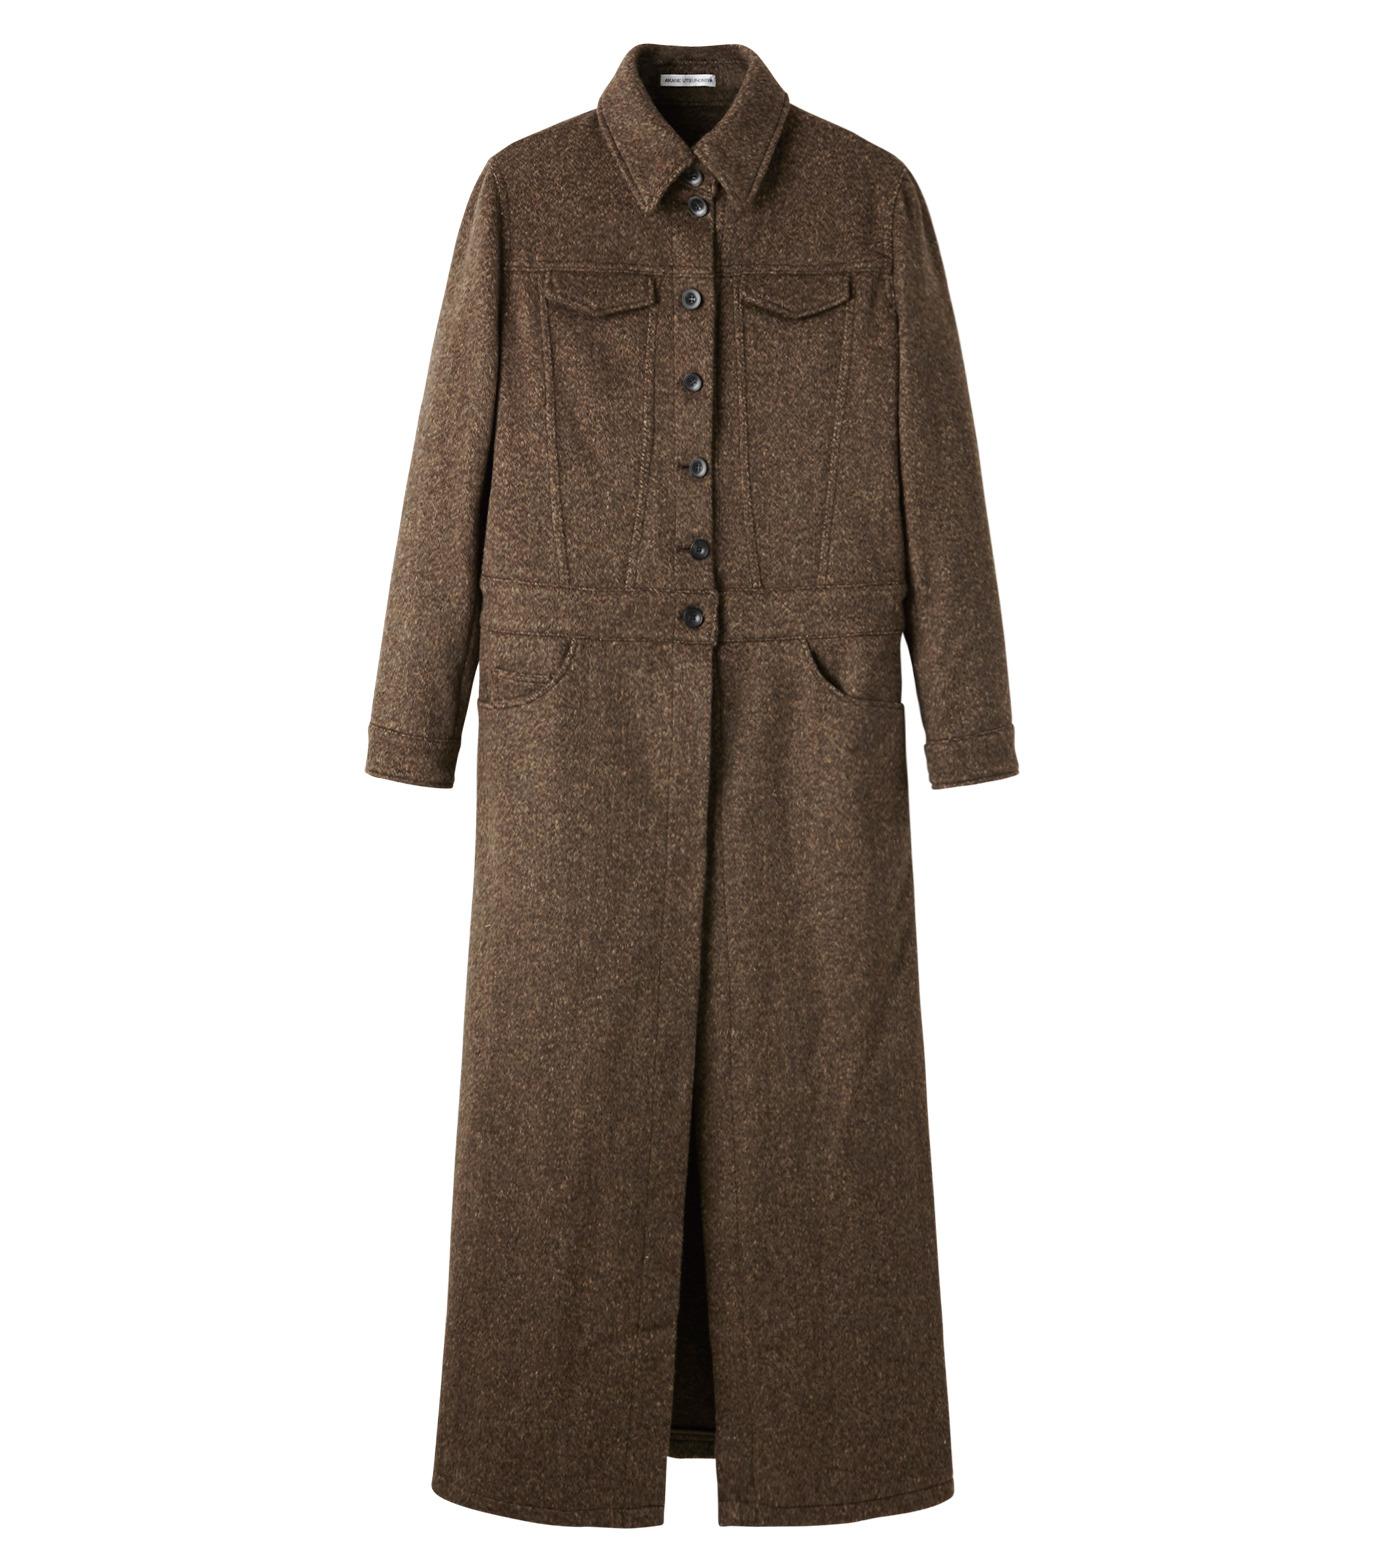 AKANE UTSUNOMIYA(アカネウツノミヤ)のNep Long Shirt Dress-DARK BROWN(ワンピース/one piece)-W16FT513008-43 拡大詳細画像1